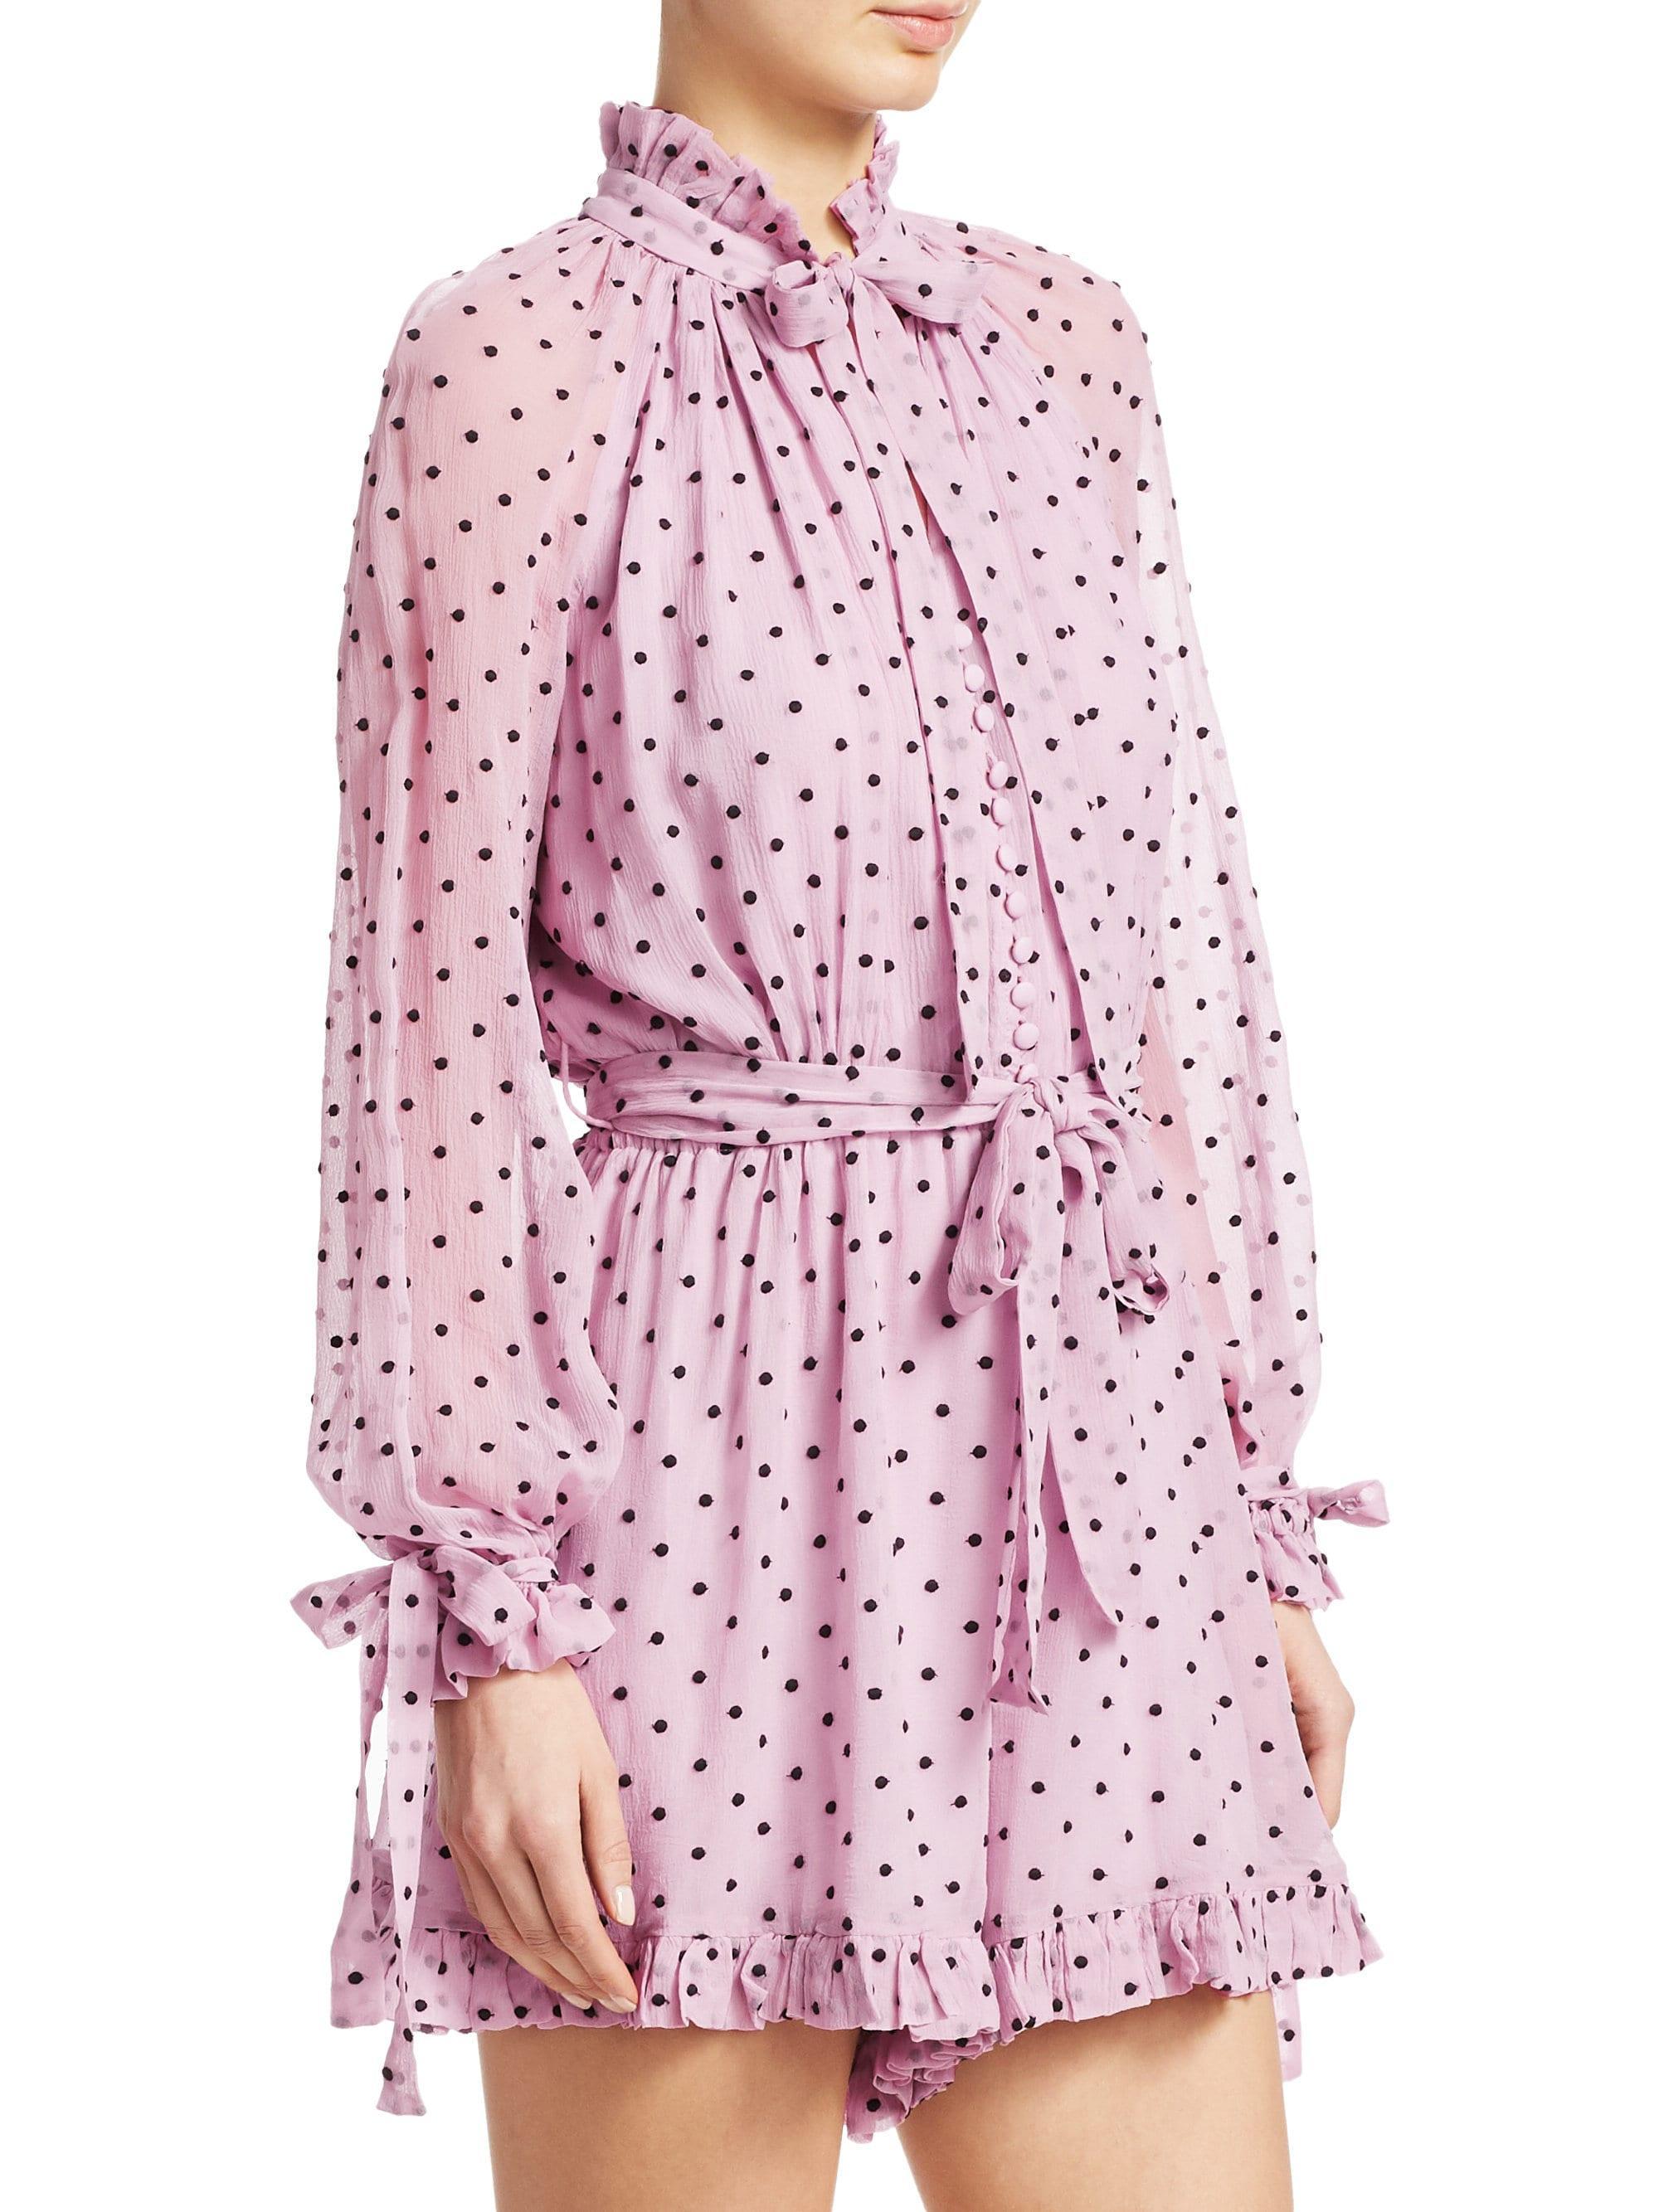 e340af1abe Zimmermann Women s Polka Dot Silk Playsuit - Lilac Dot - Size 0 (2-4) - Lyst